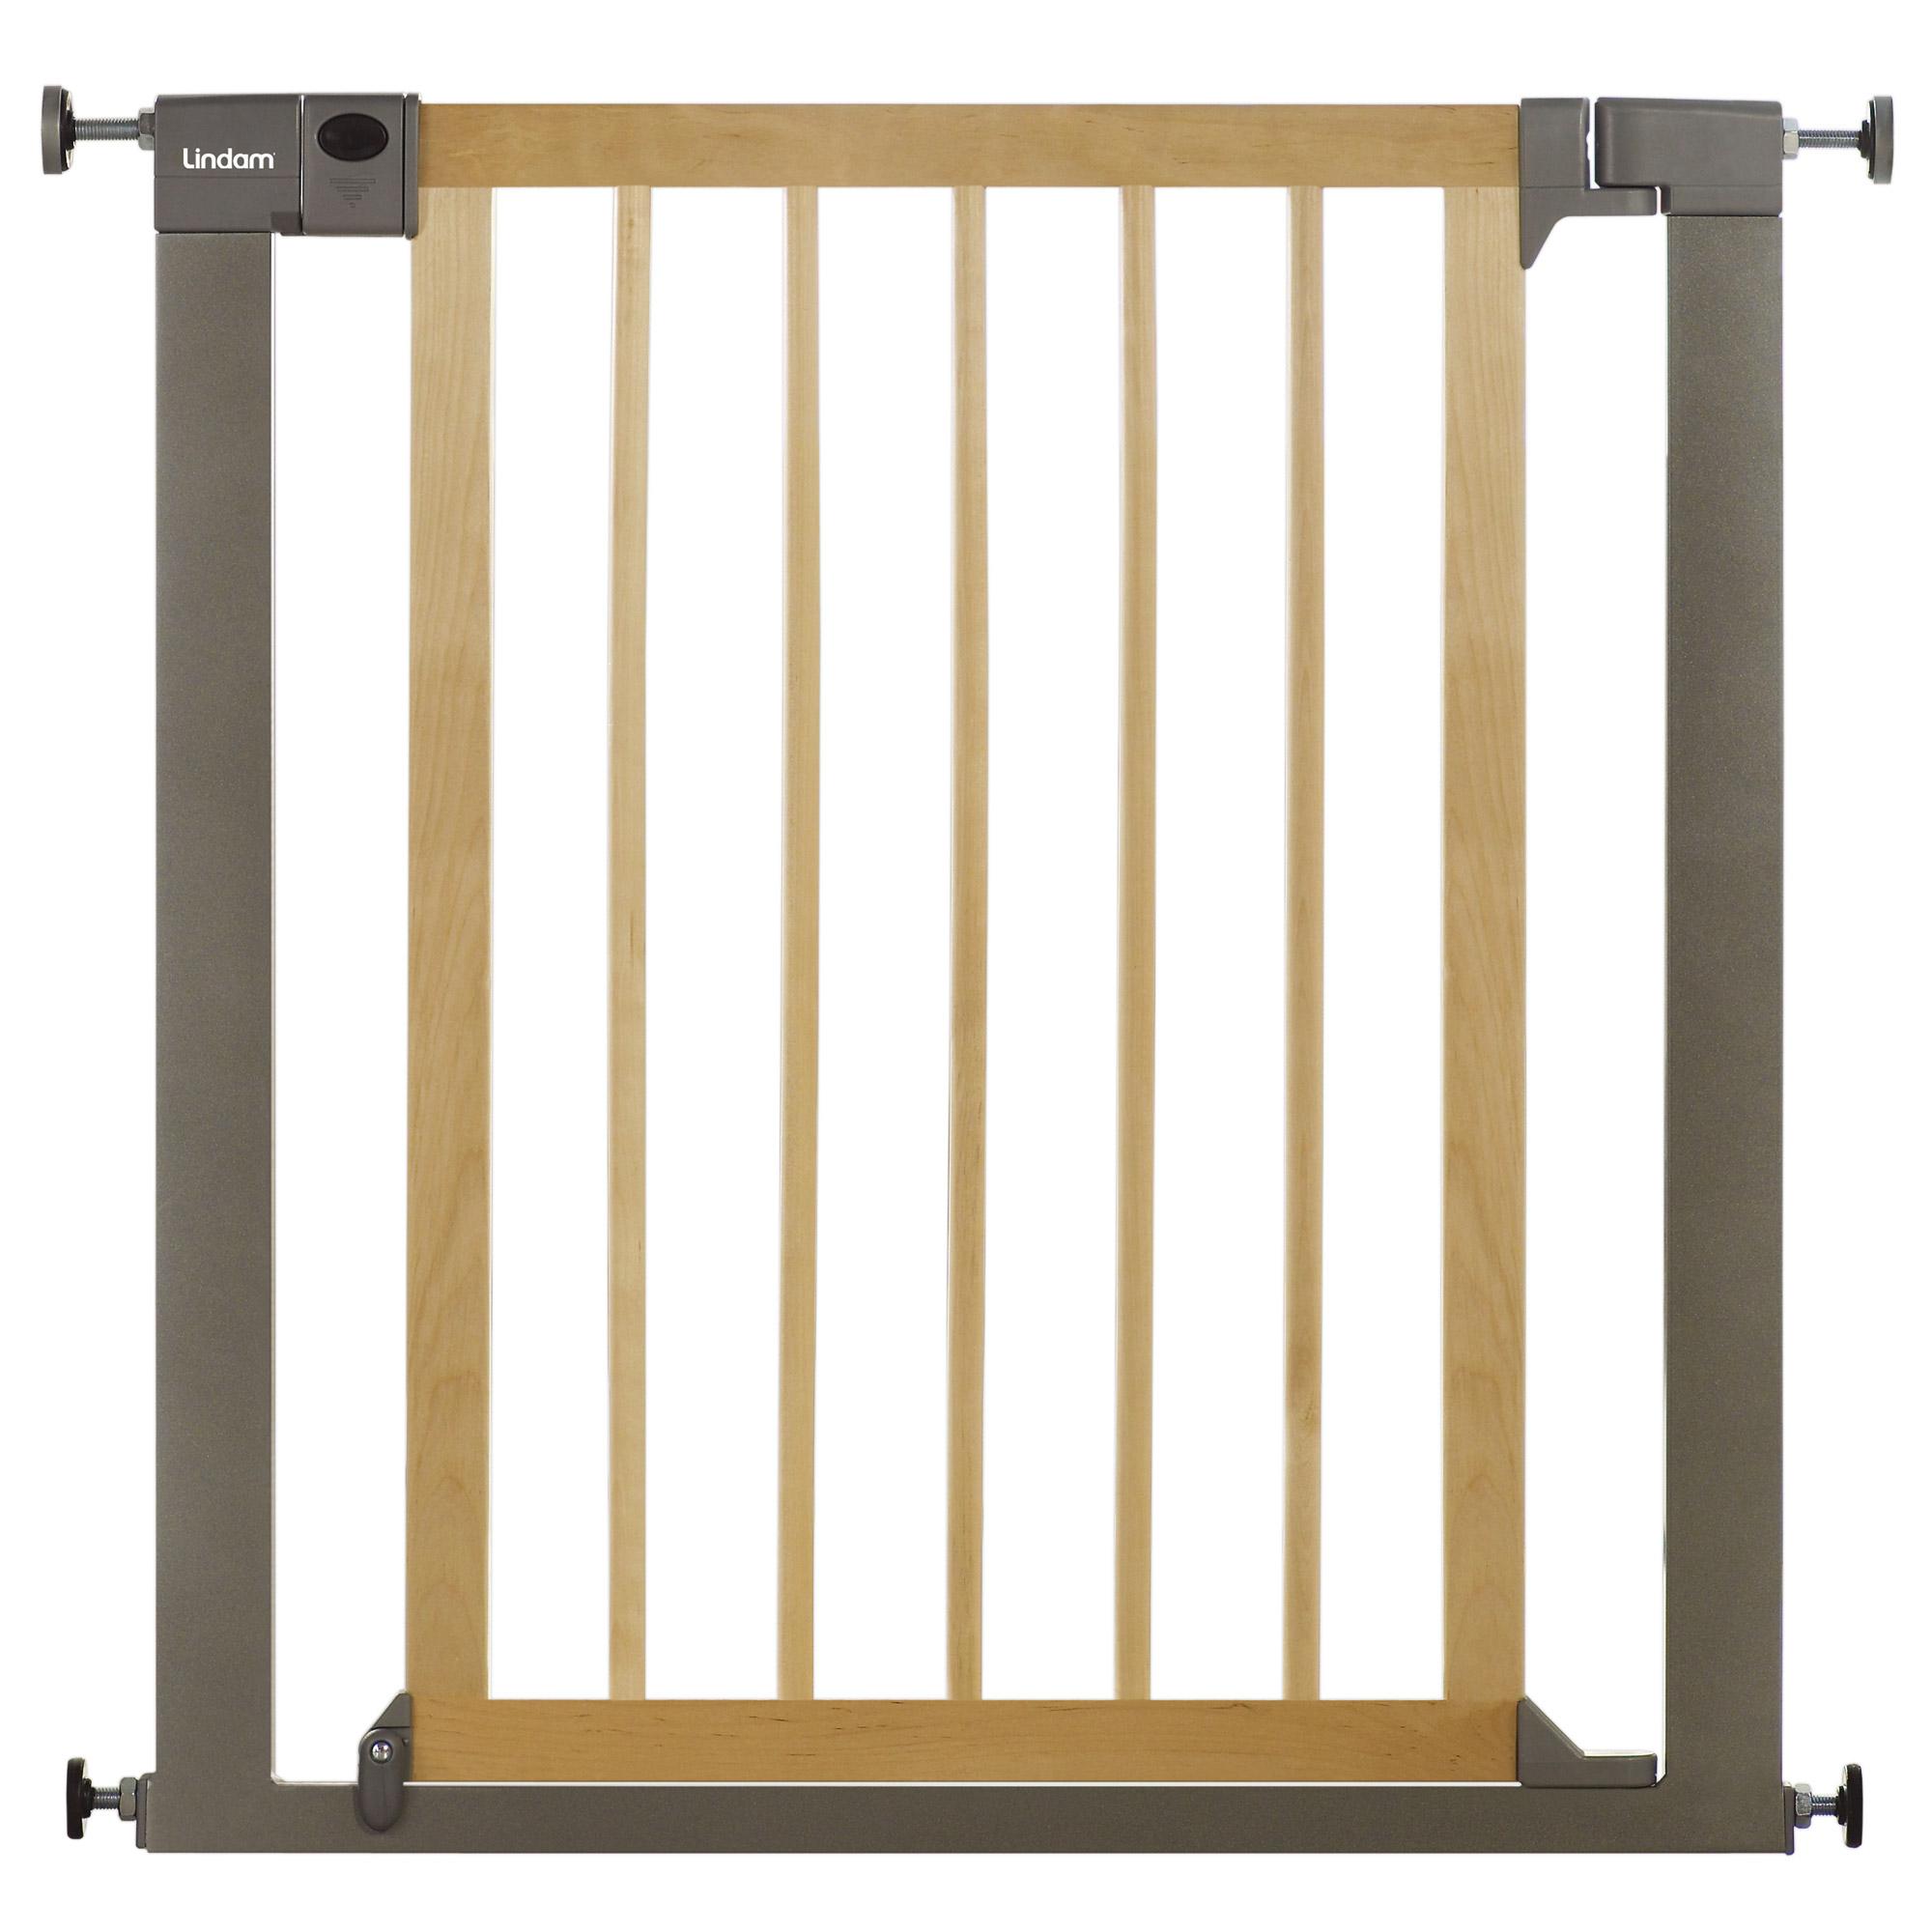 barriere lindam